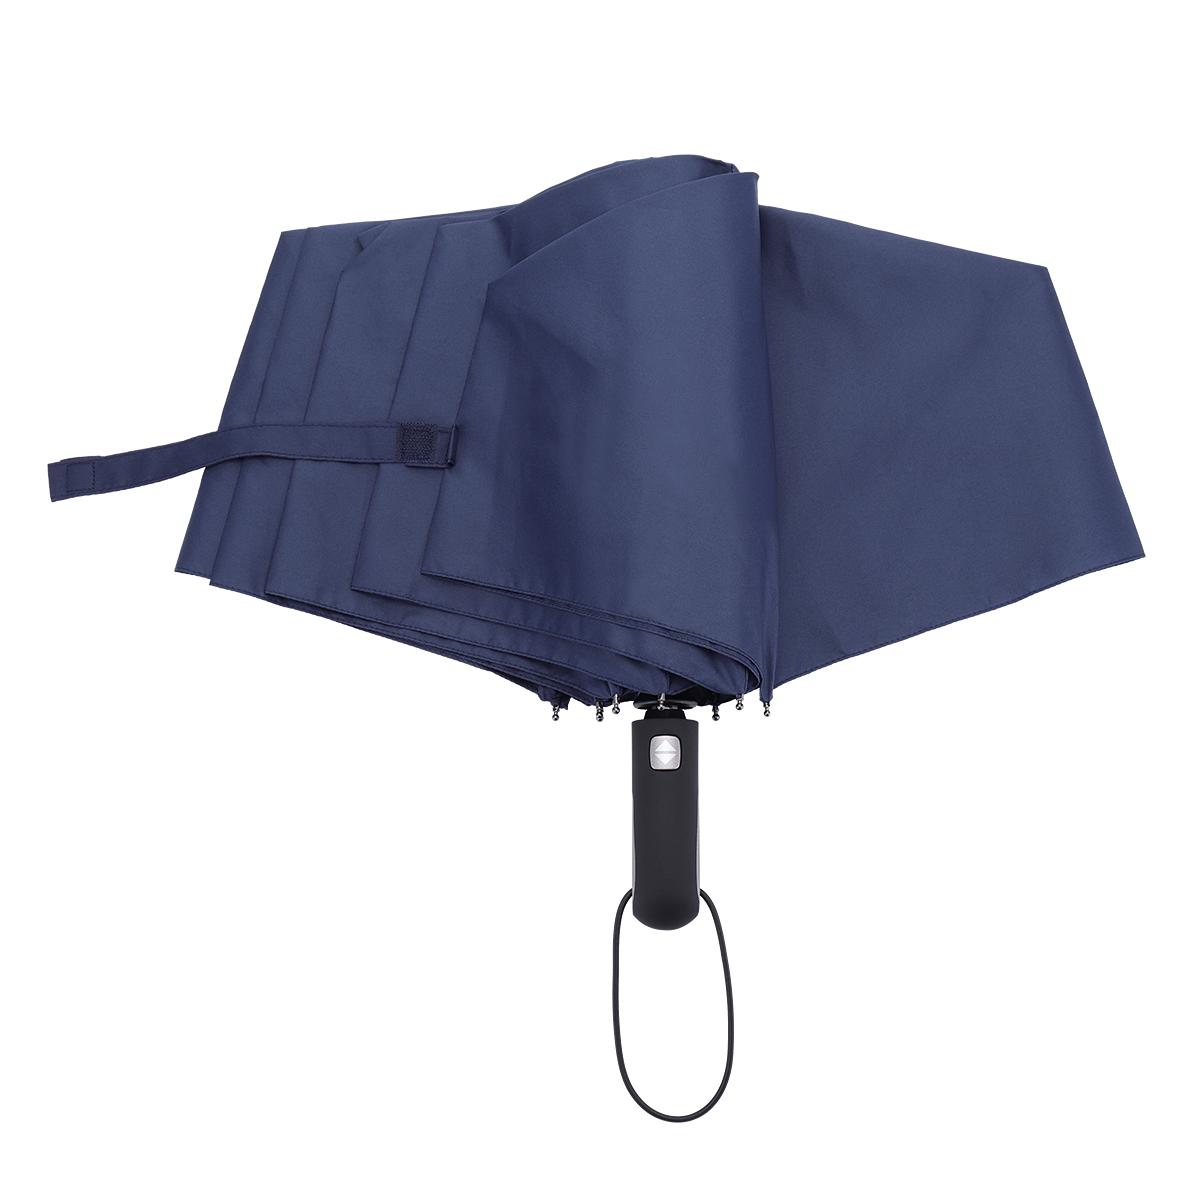 Xmund XD-HK4 47 Inch Large Automatic Open Folding Portable Golf Umbrella  Windproof Oversized Umbrella for Men